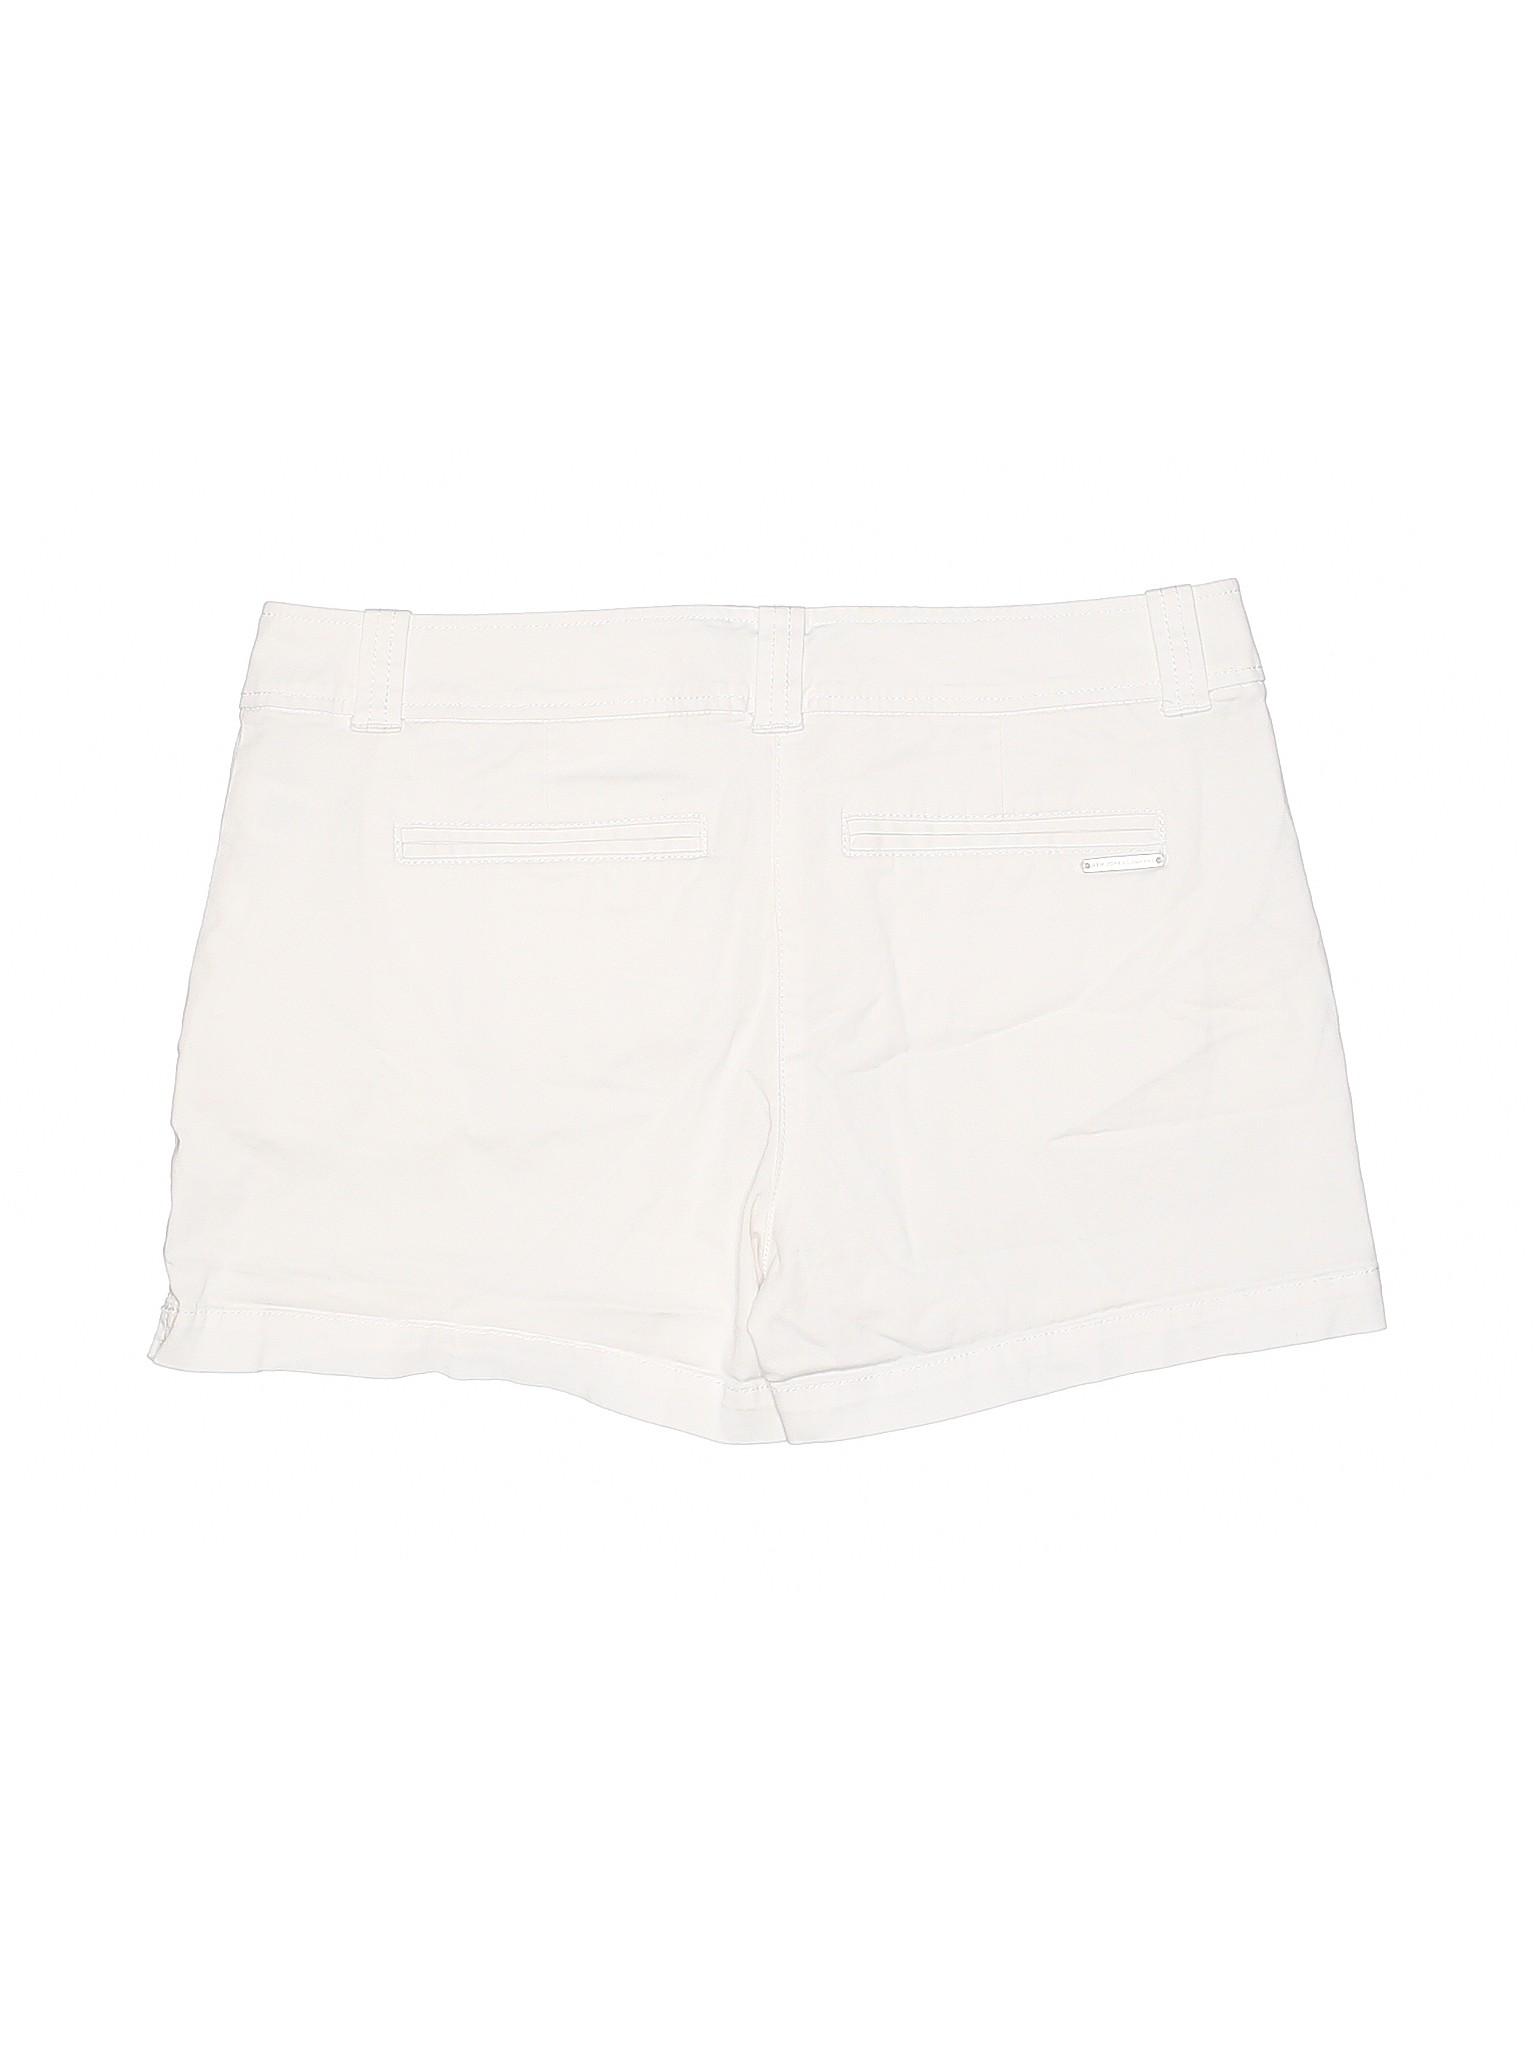 Company York amp; Shorts New Khaki Boutique wPxvCHqt